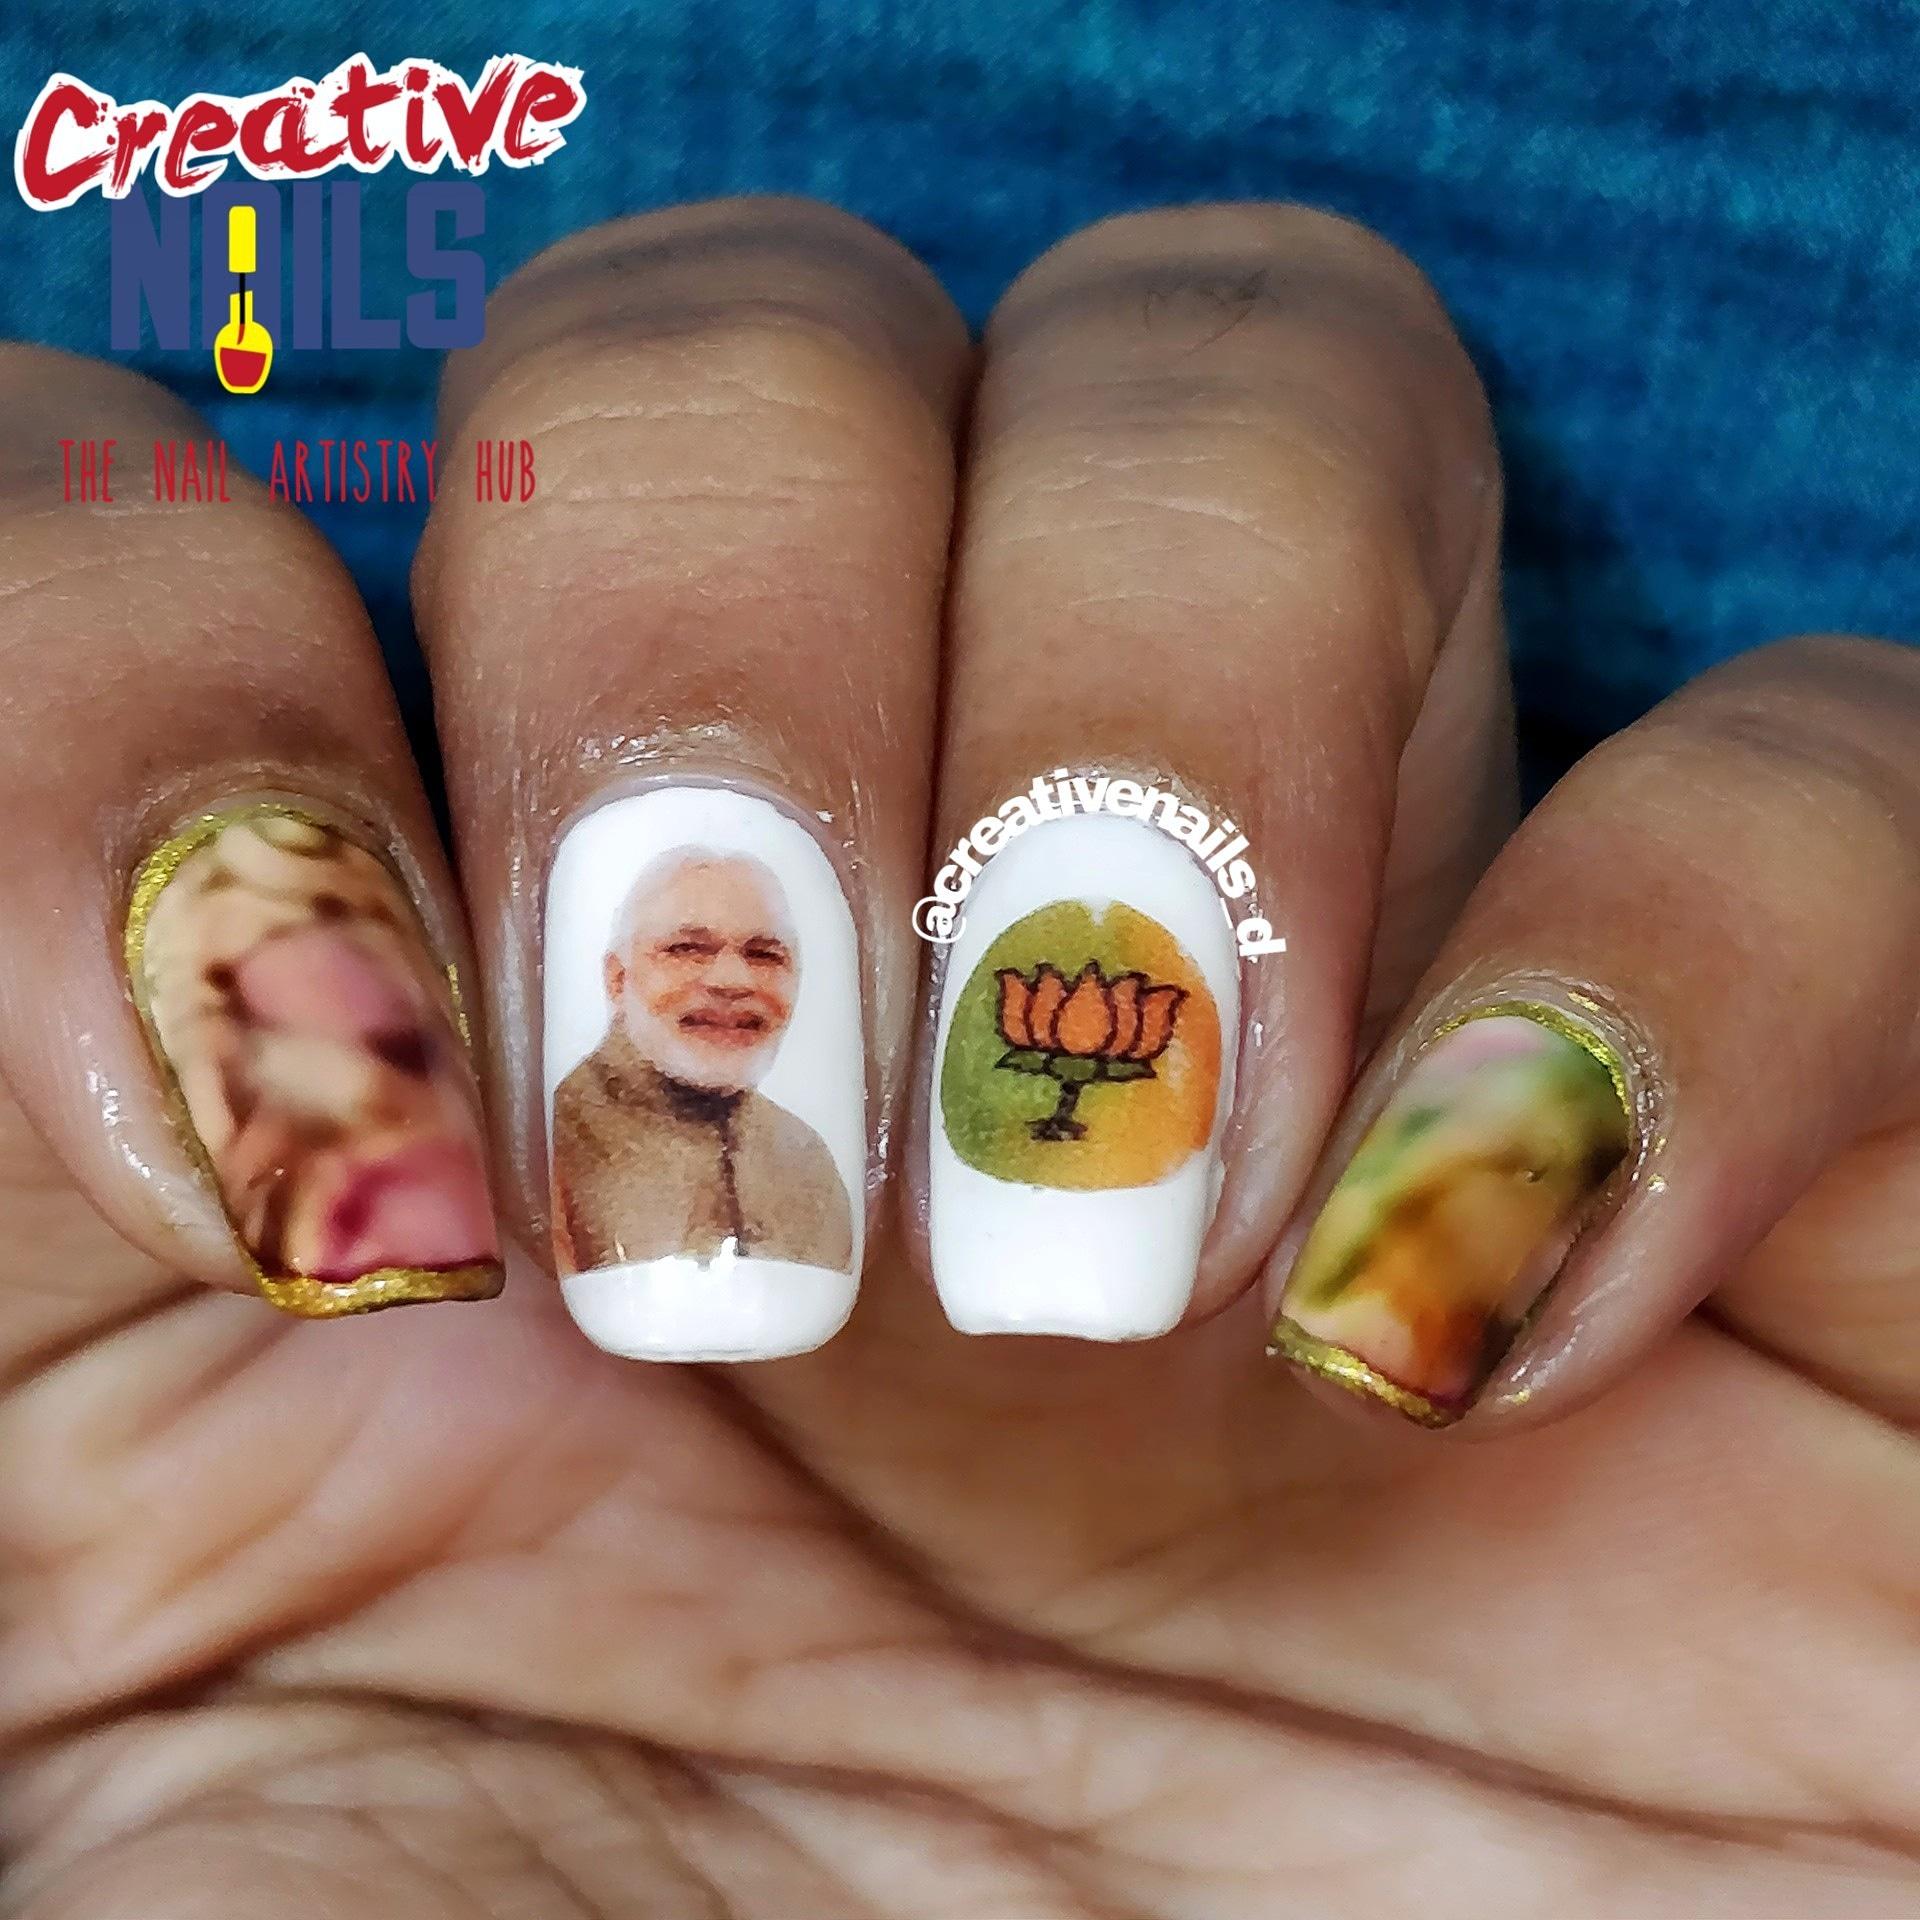 Phir Ek Baar Modi Sarkar - Good Luck Modi Ji Nail Art!